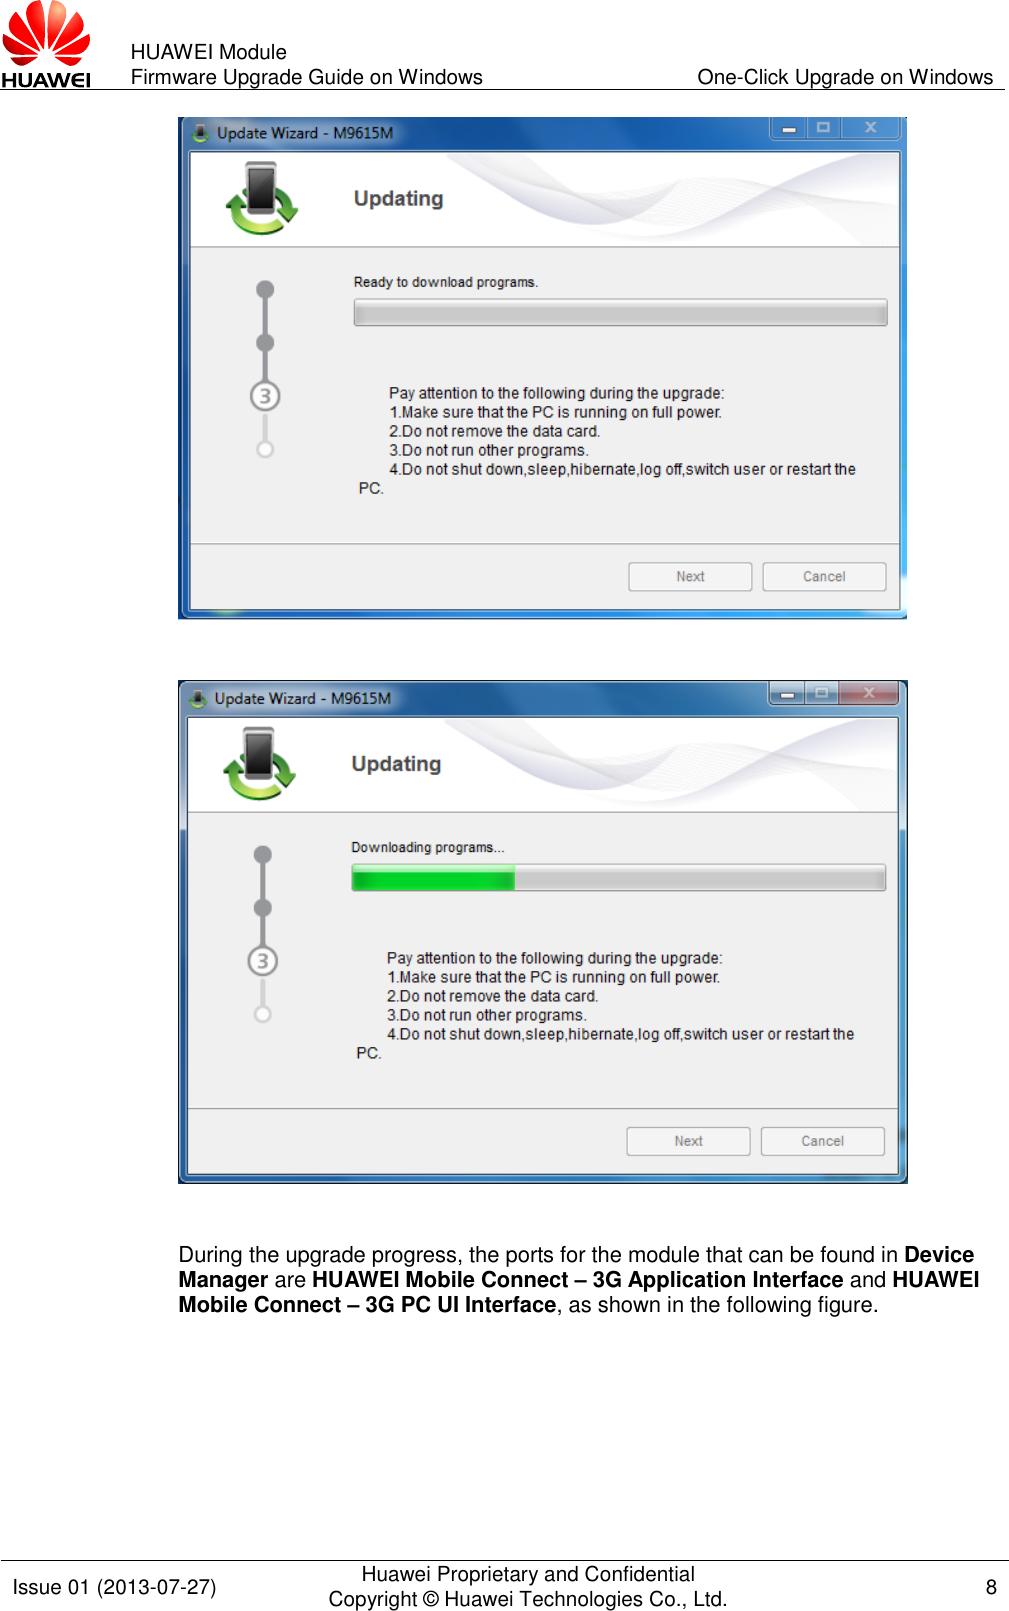 Huawei Module Firmware Upgrade Guide On Windows (V100R001 01